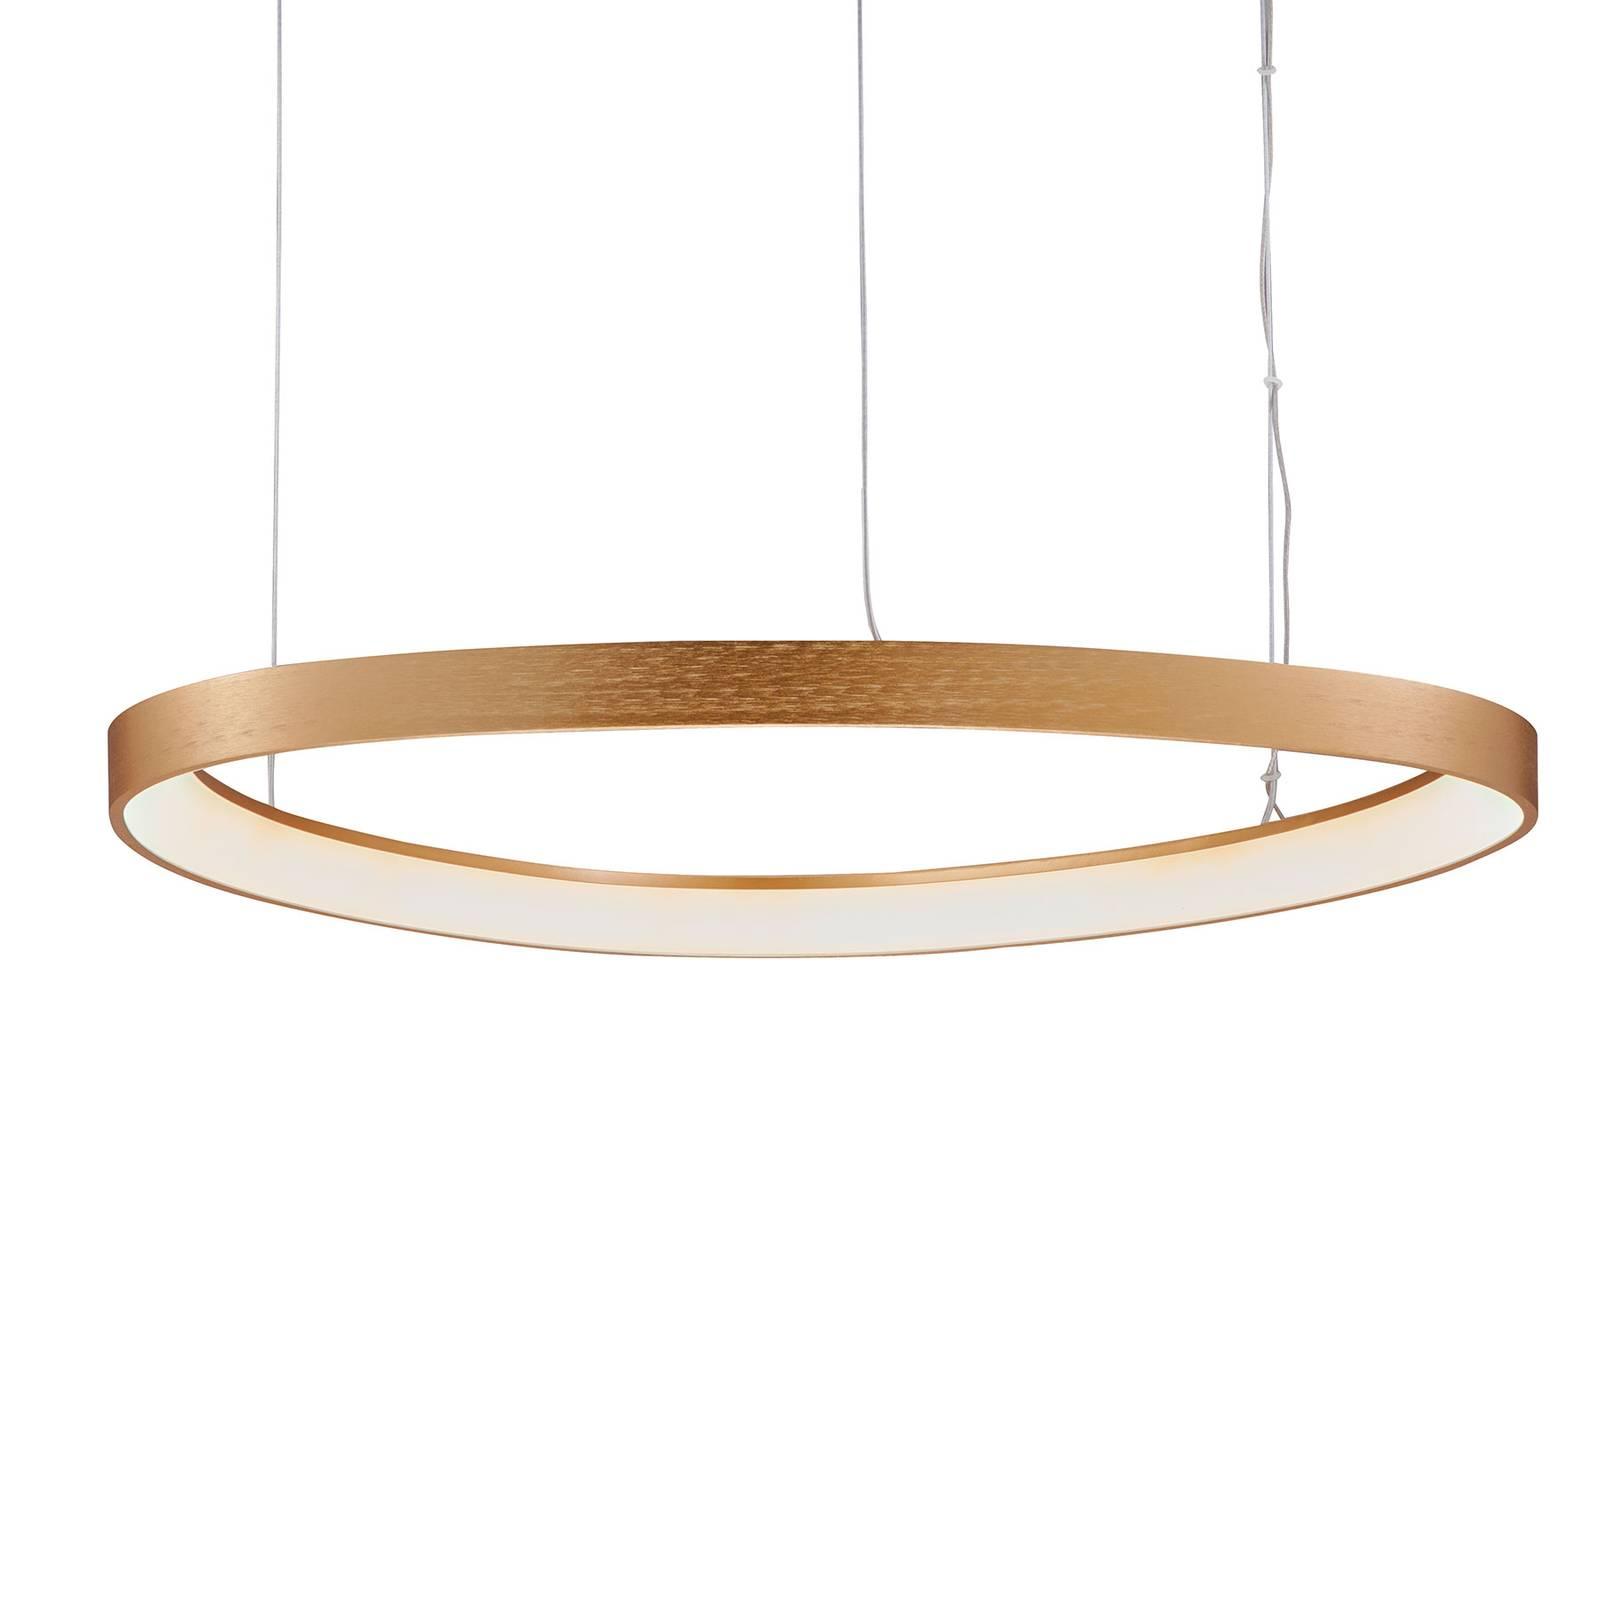 LED-Hängeleuchte Loop, gold, Ø 60 cm